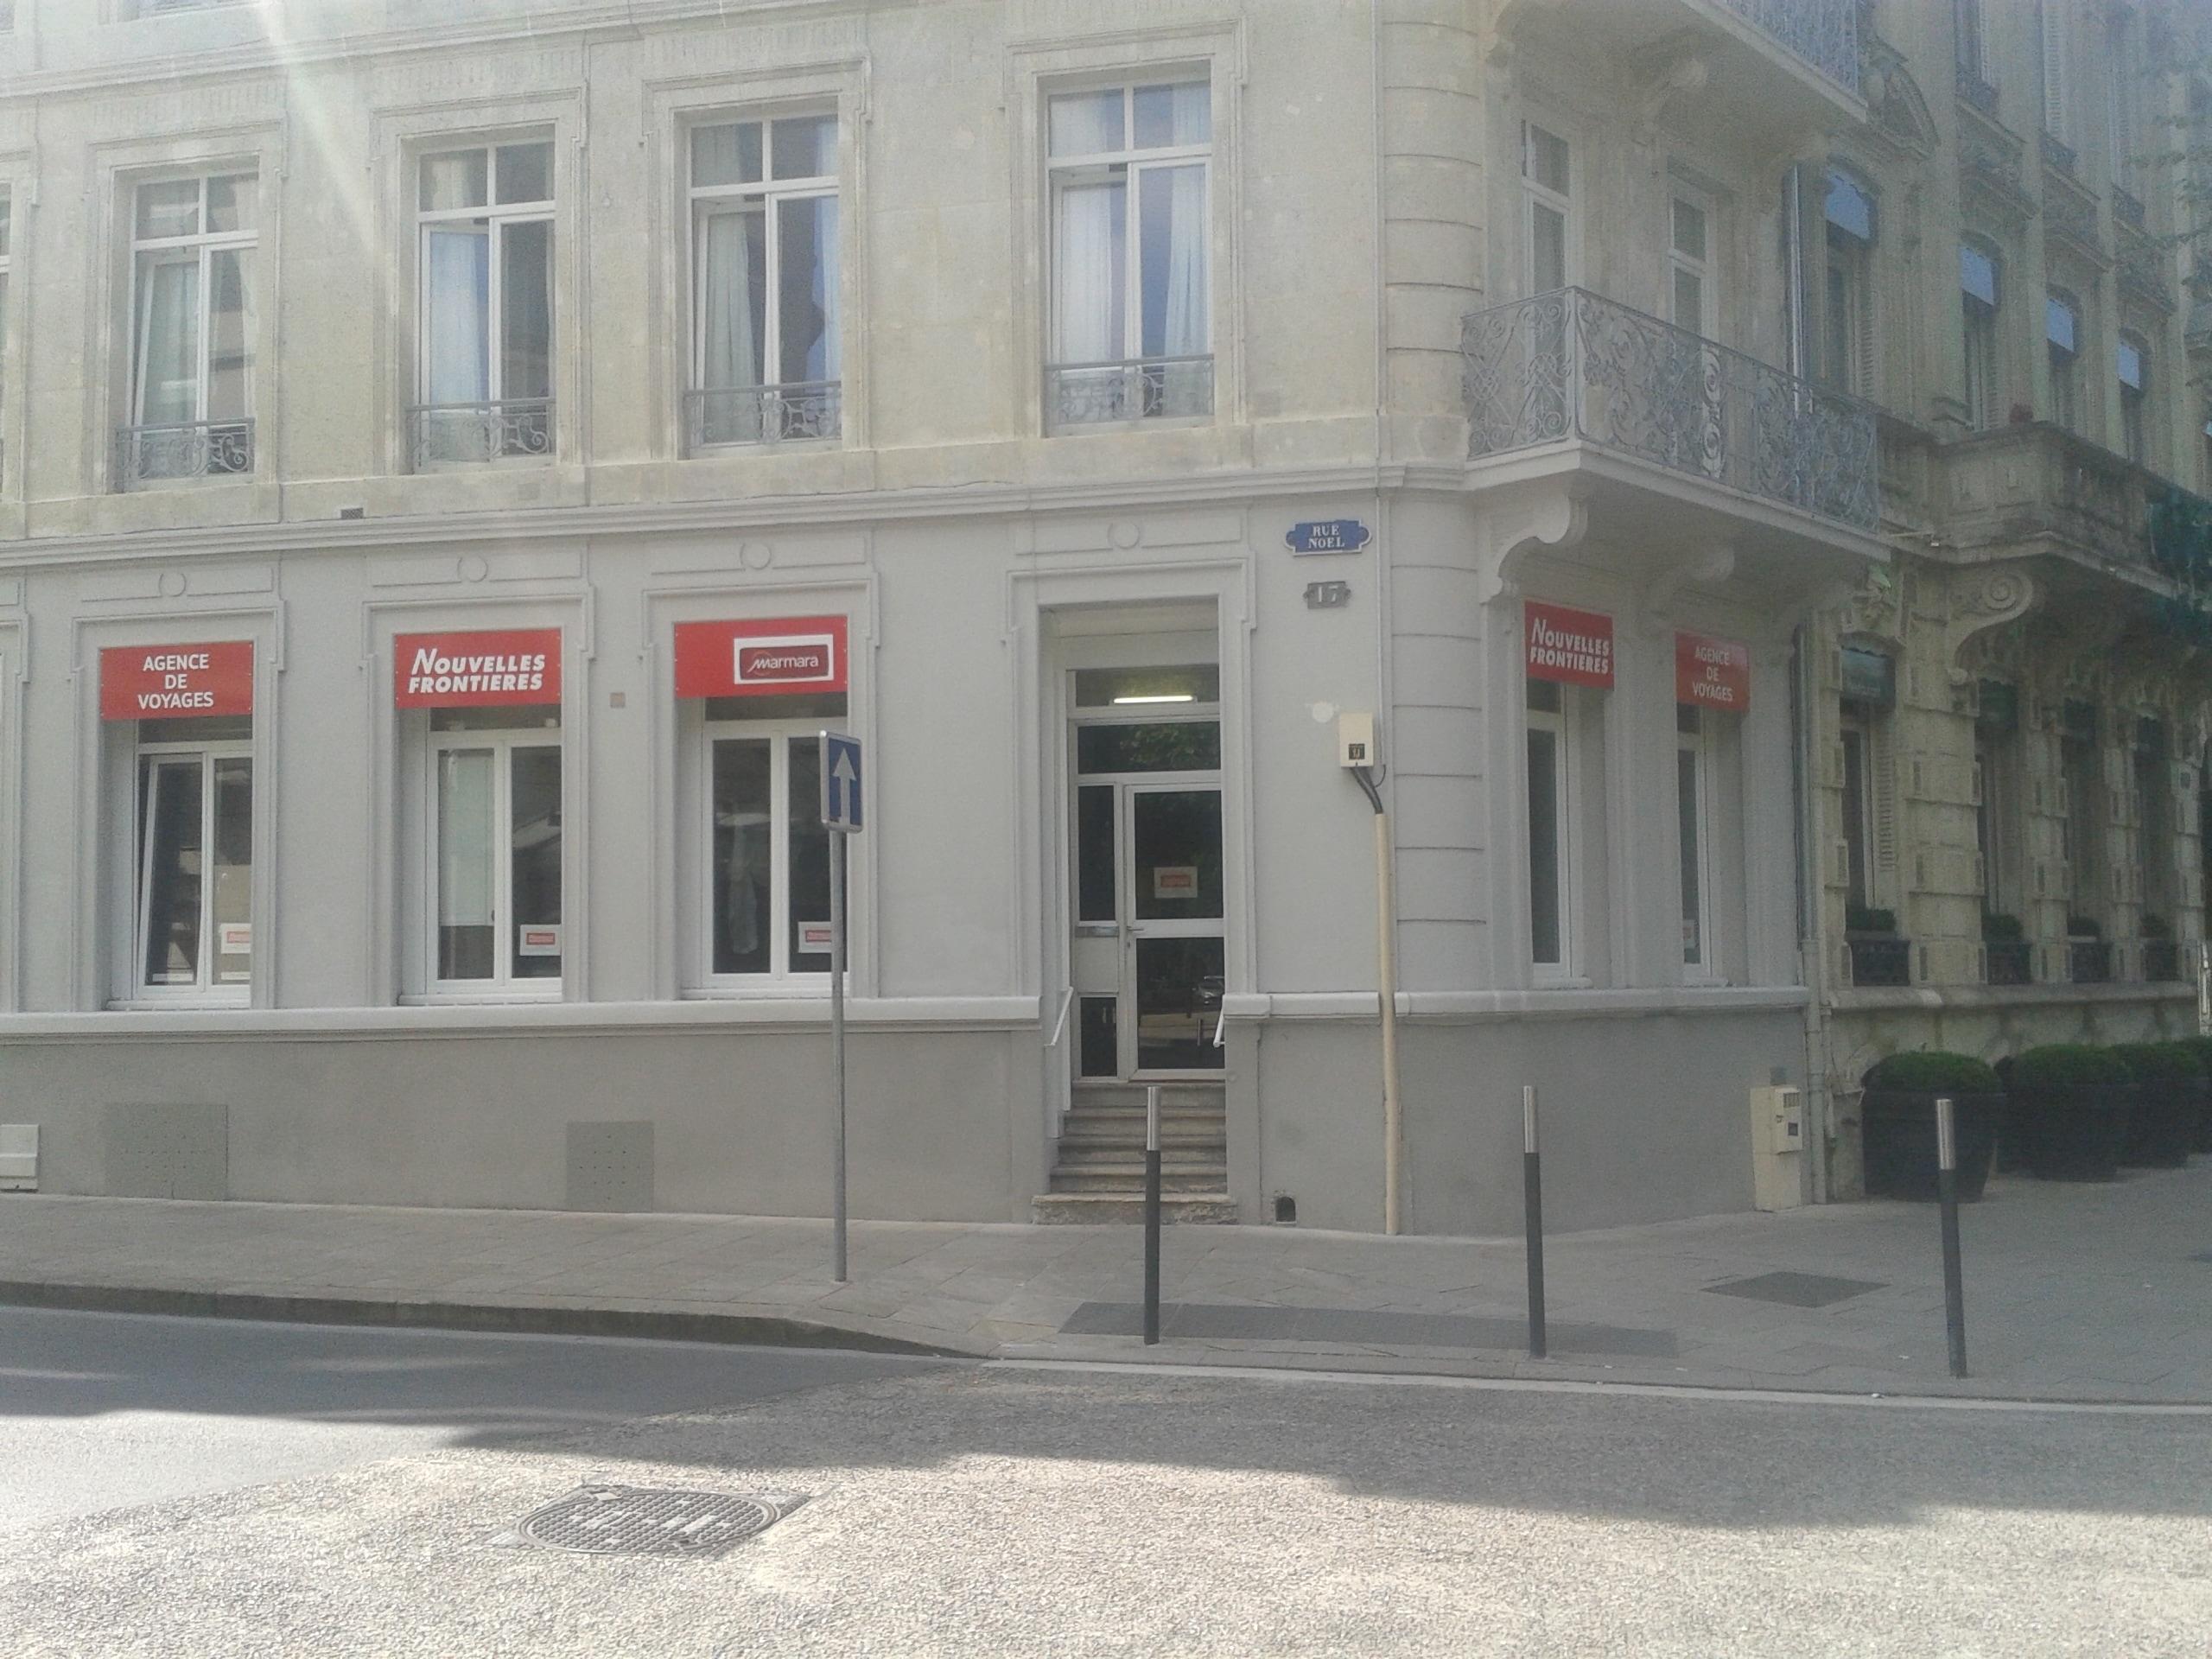 Agence de voyages nouvelles fronti res reims tui for Agence paysage reims